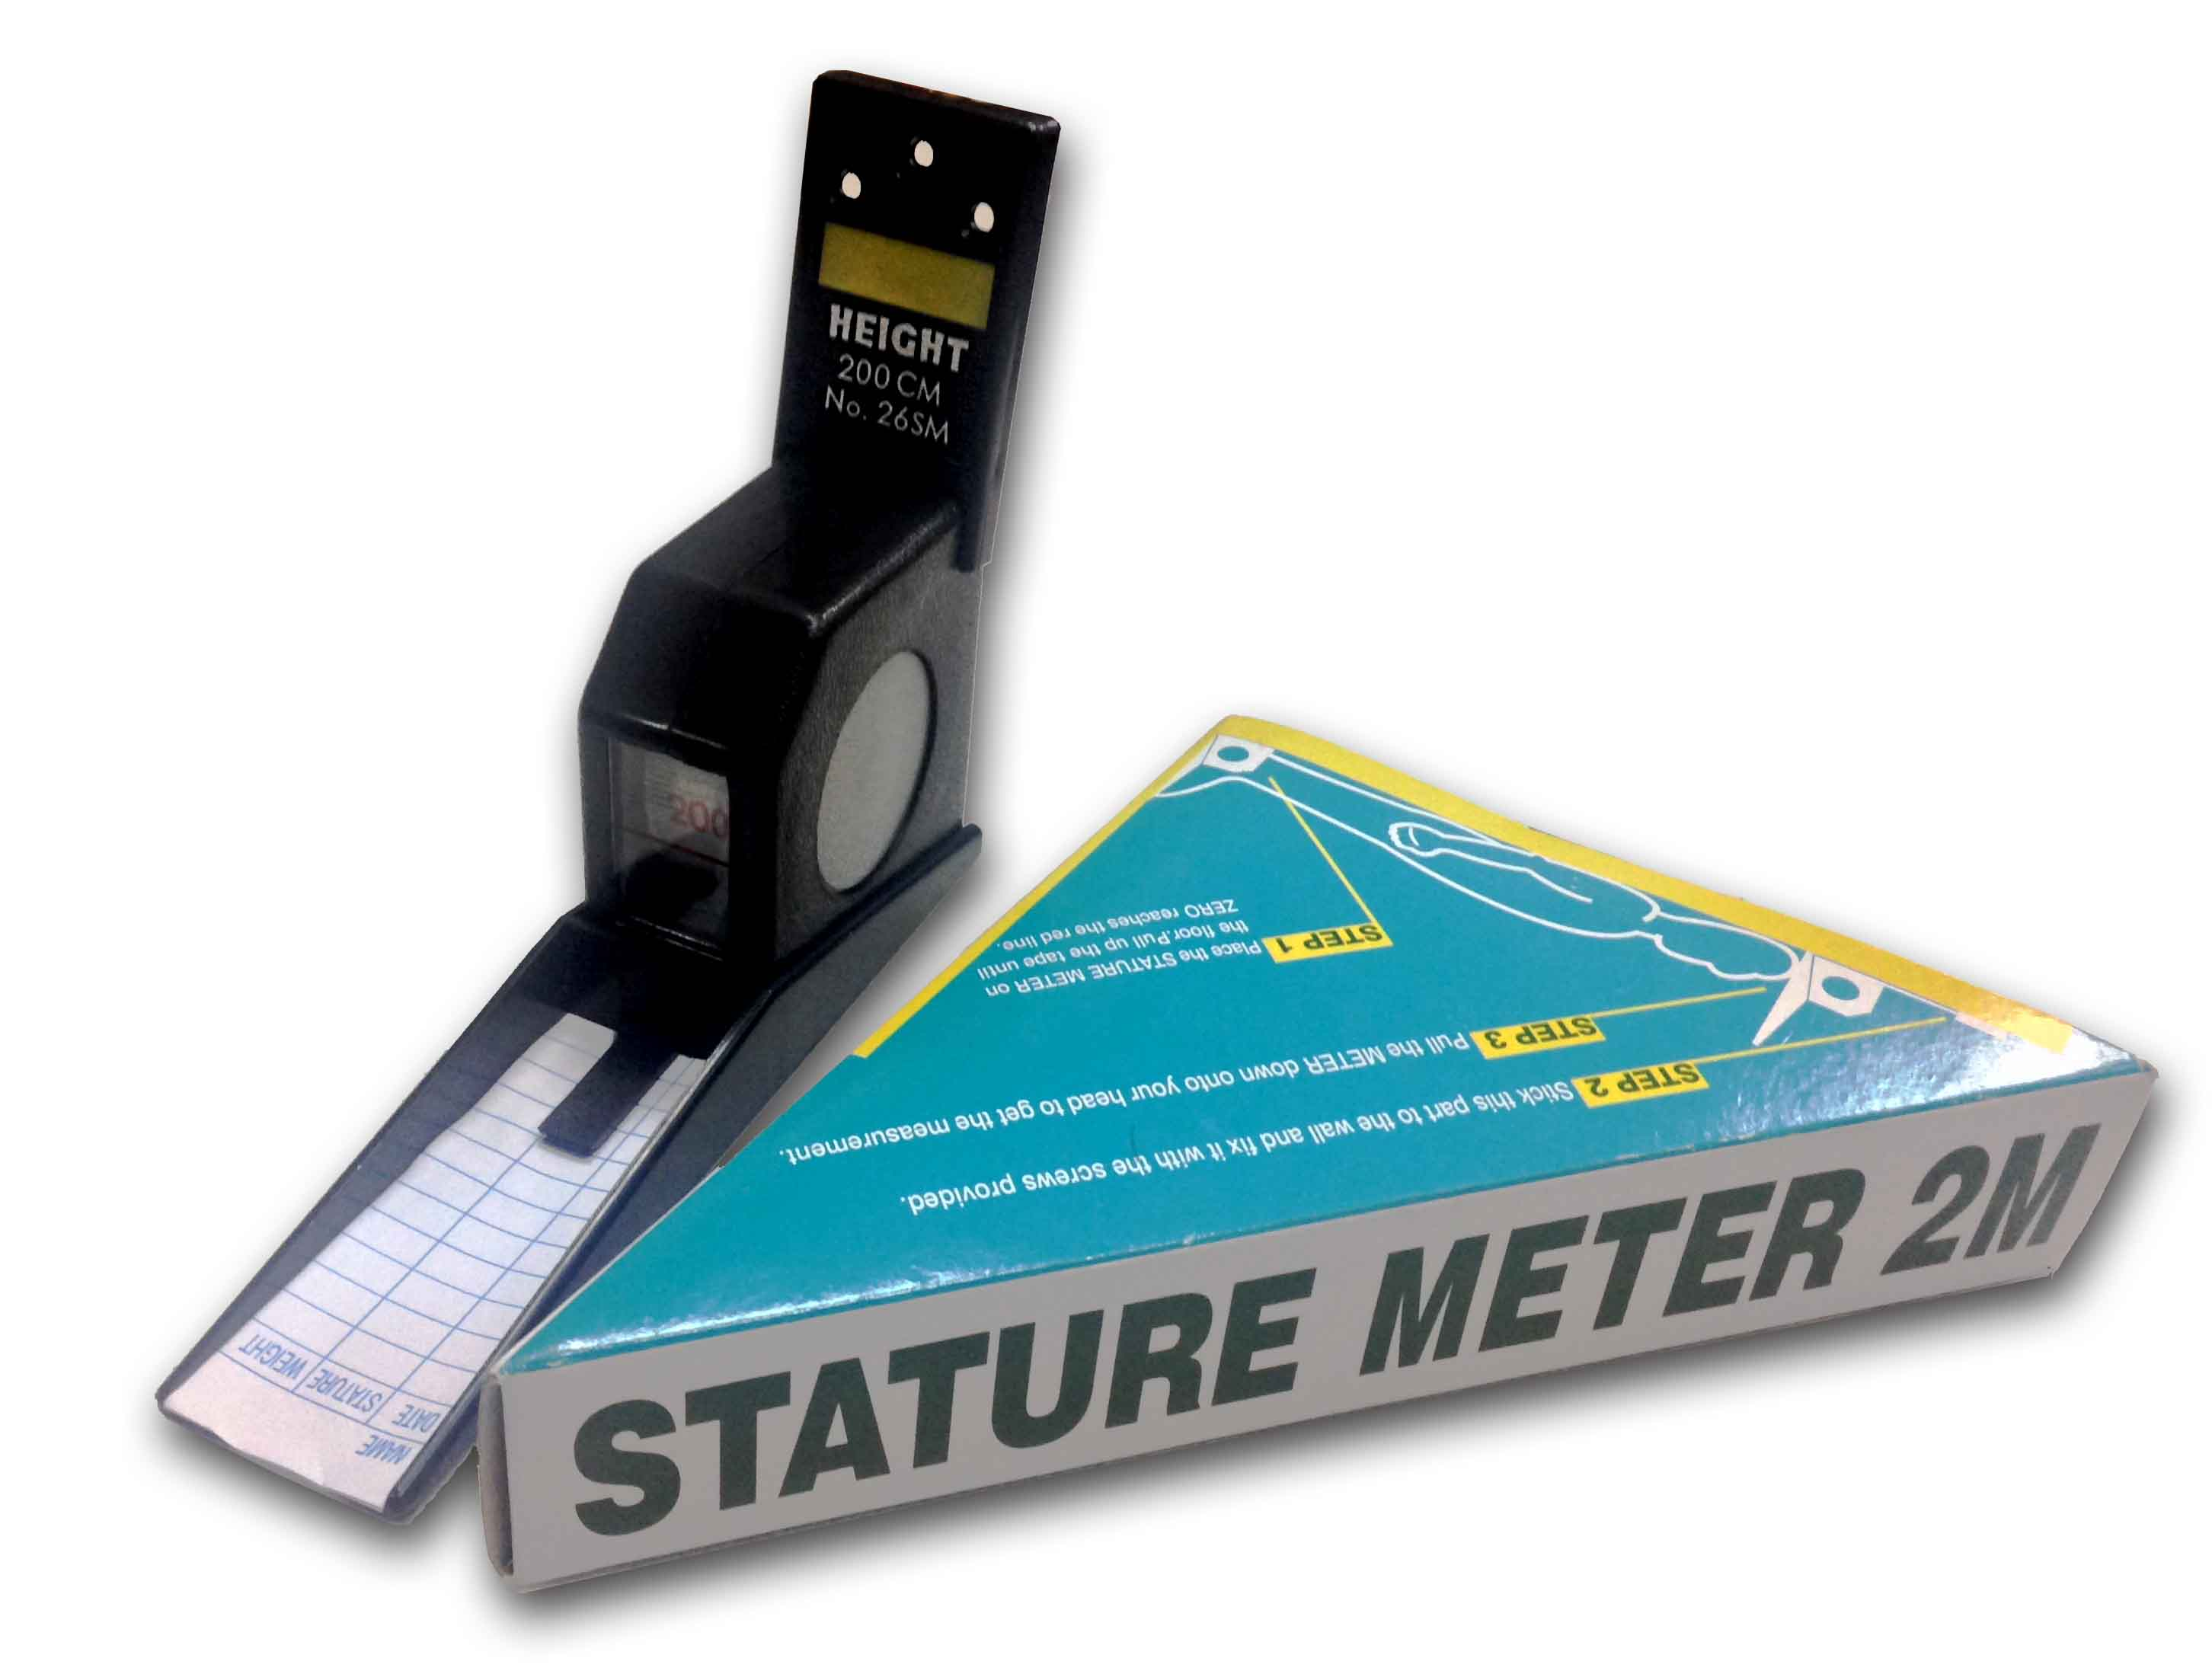 Image result for stature meter